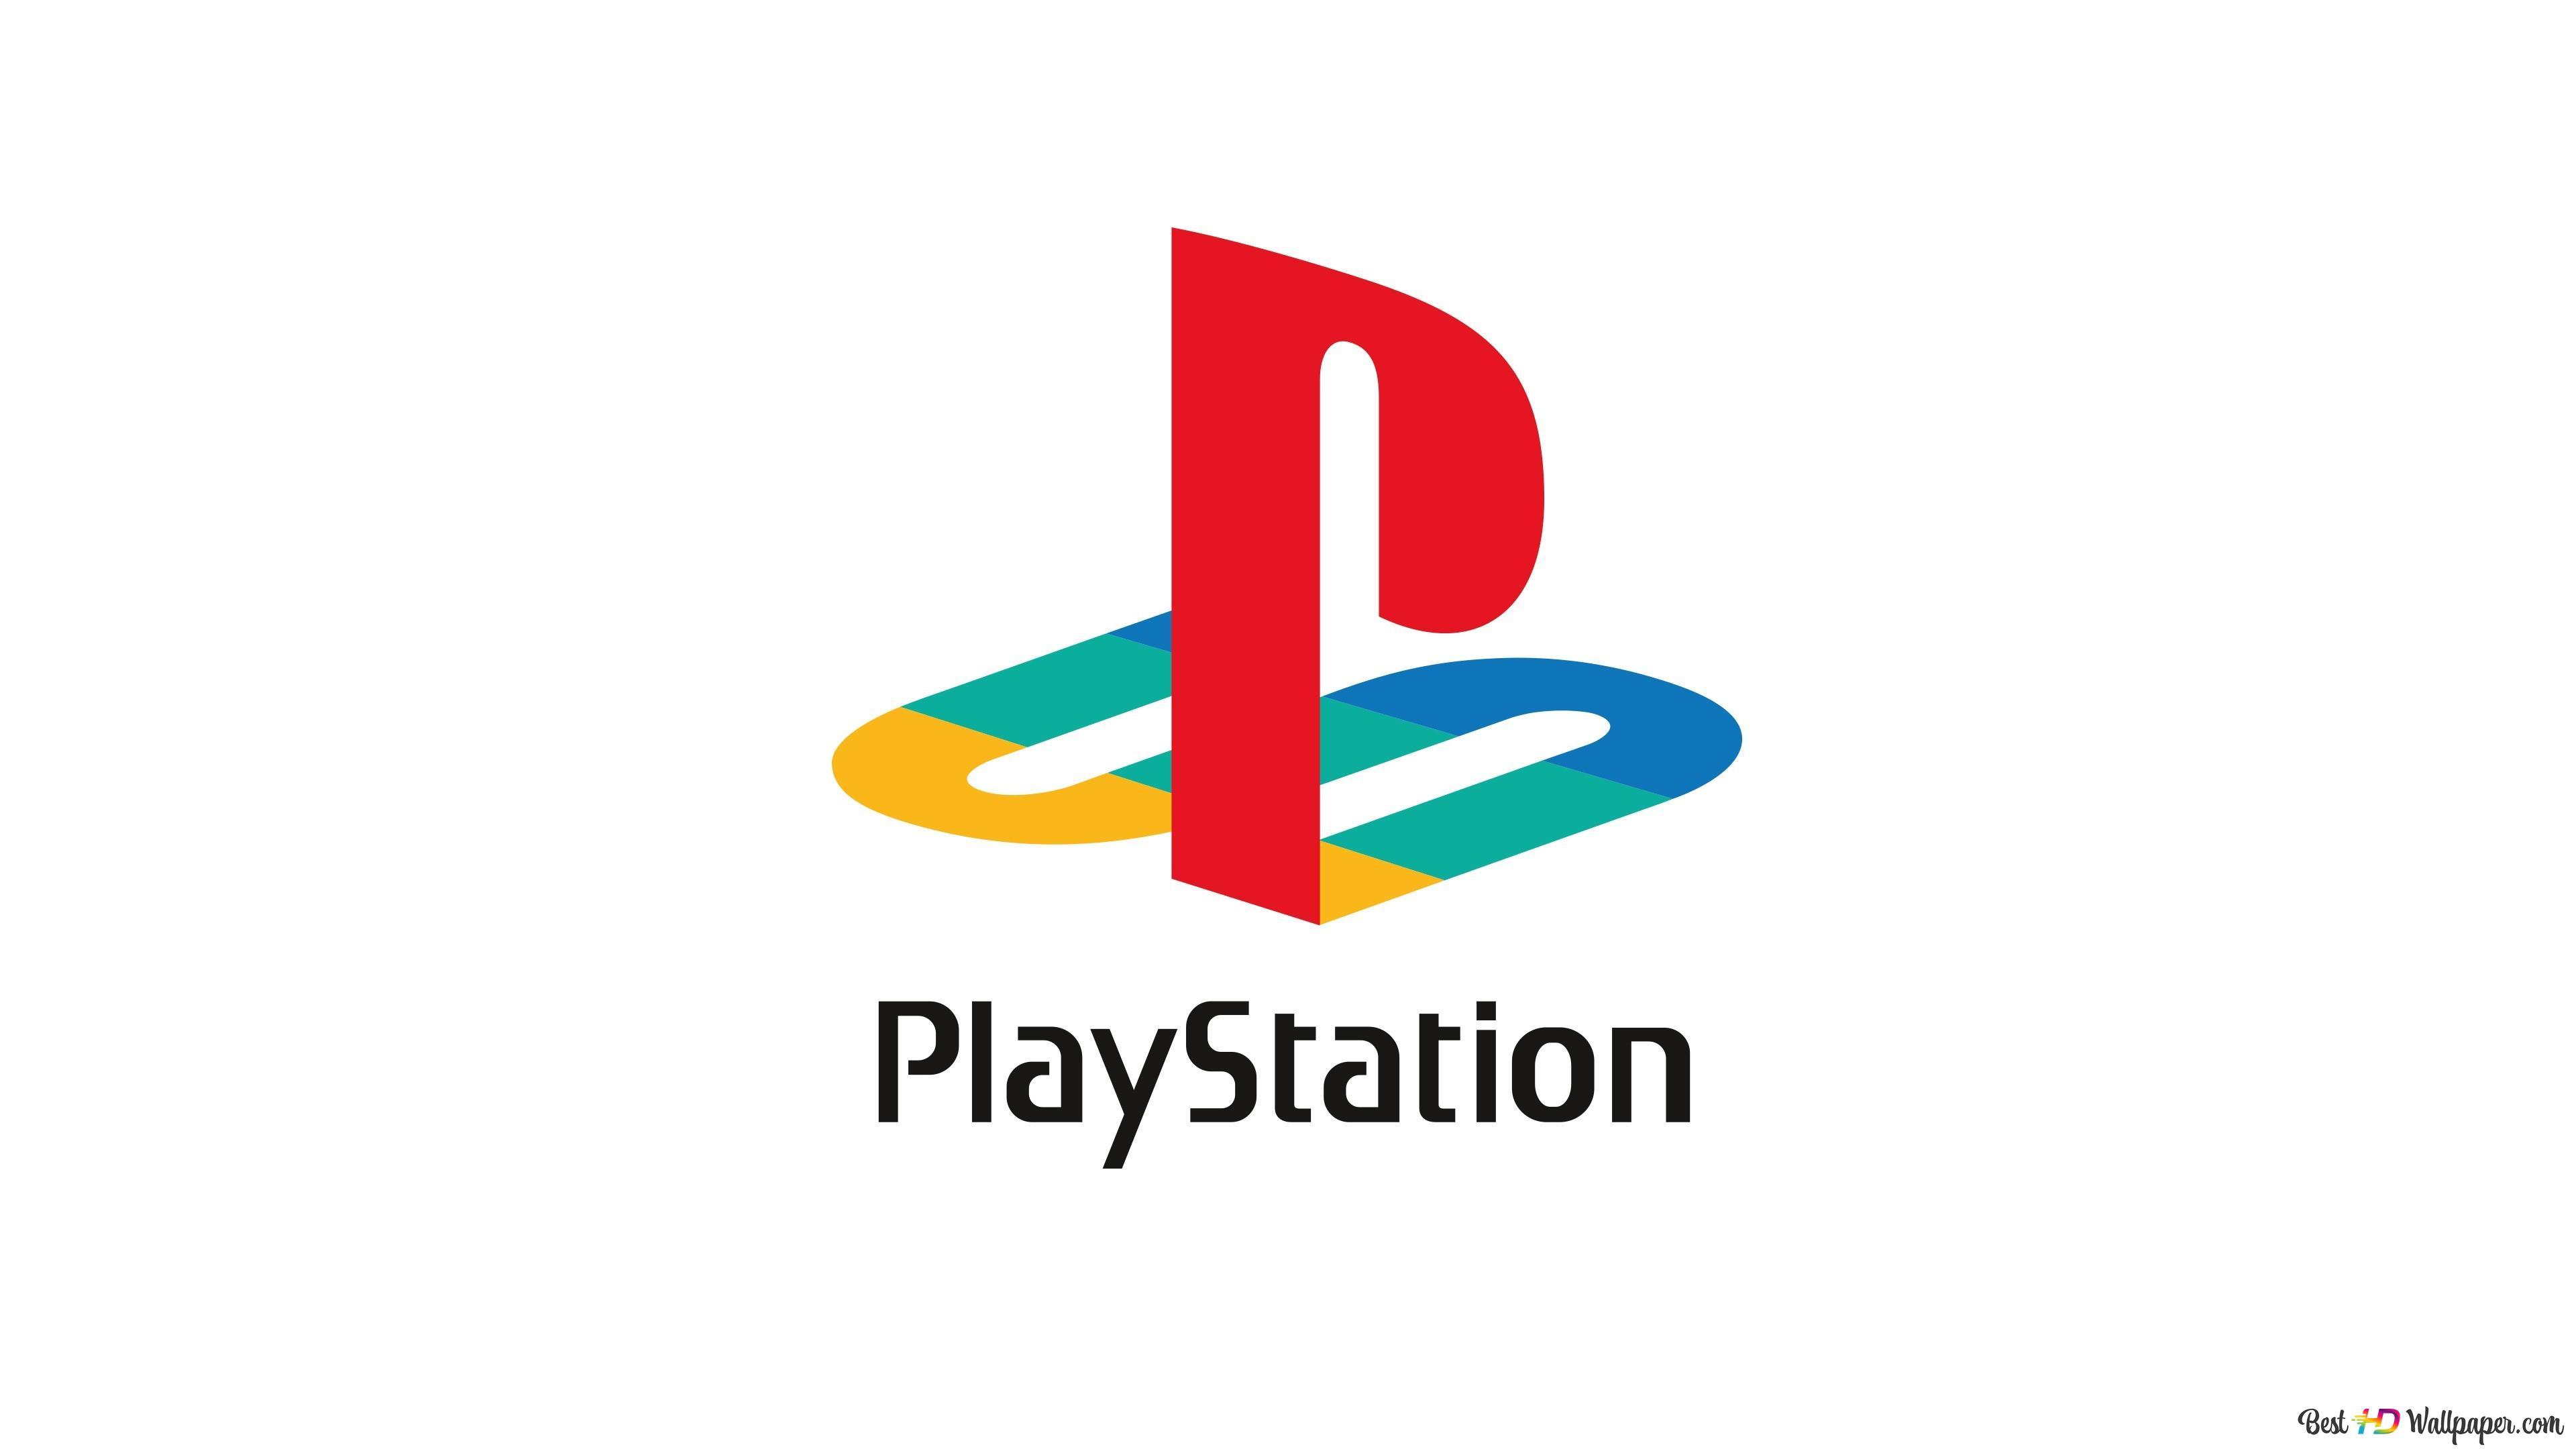 Playstation Hd Wallpaper Download